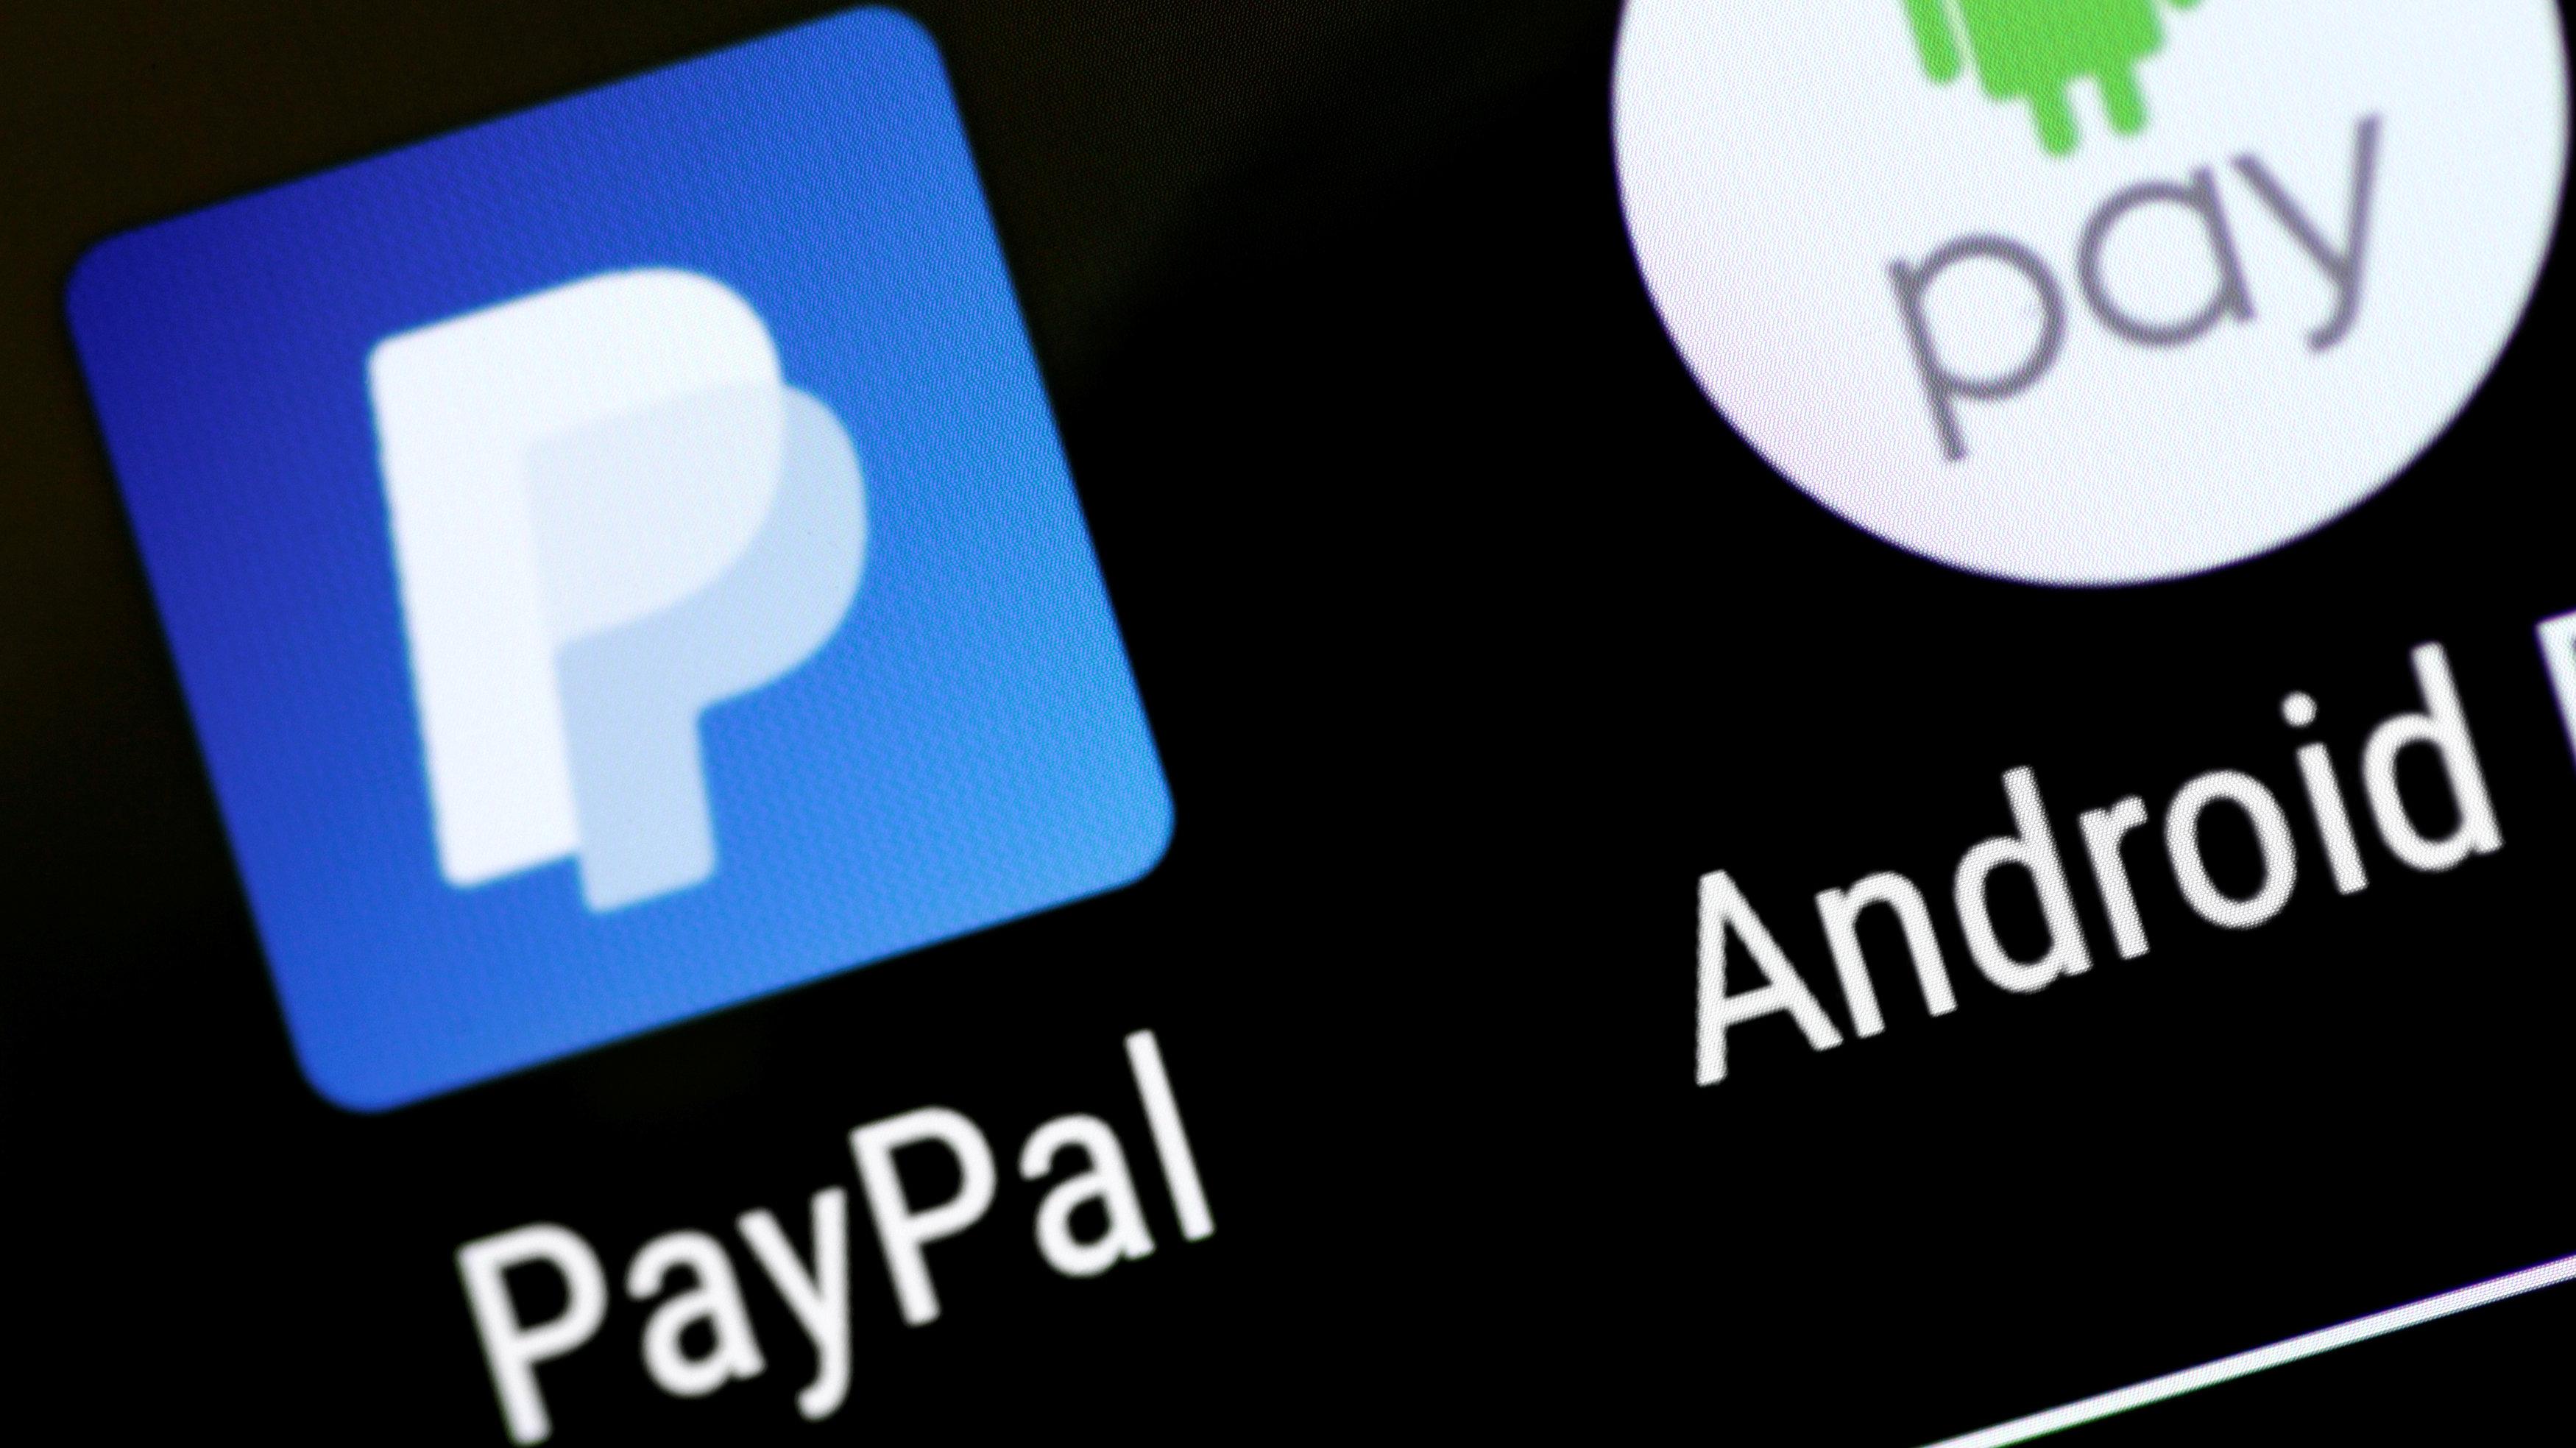 paypal ceo dan schulman says the acquisition binge will continue